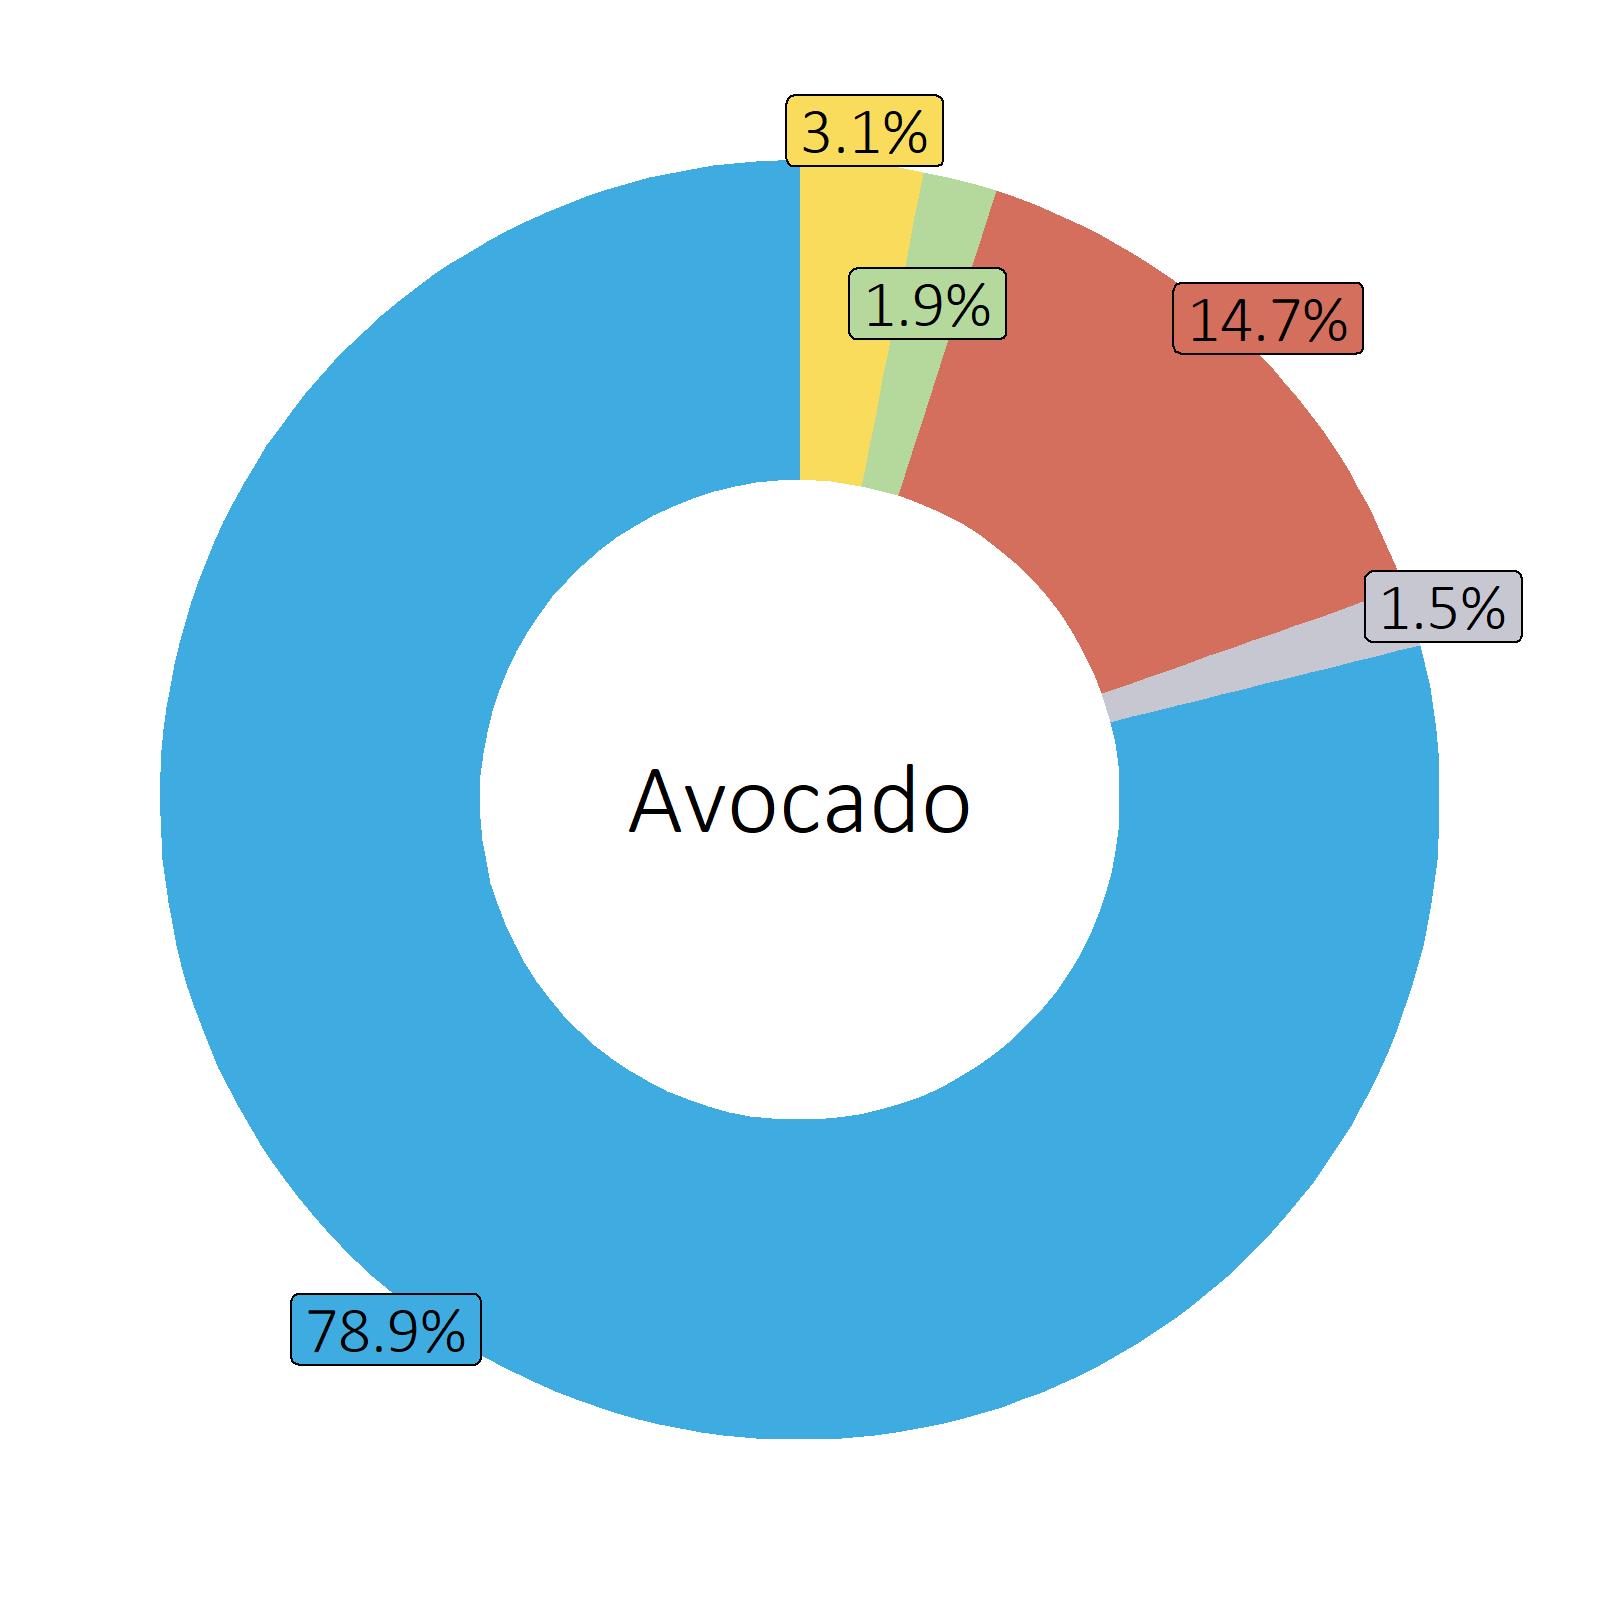 Bestandteile Avocado